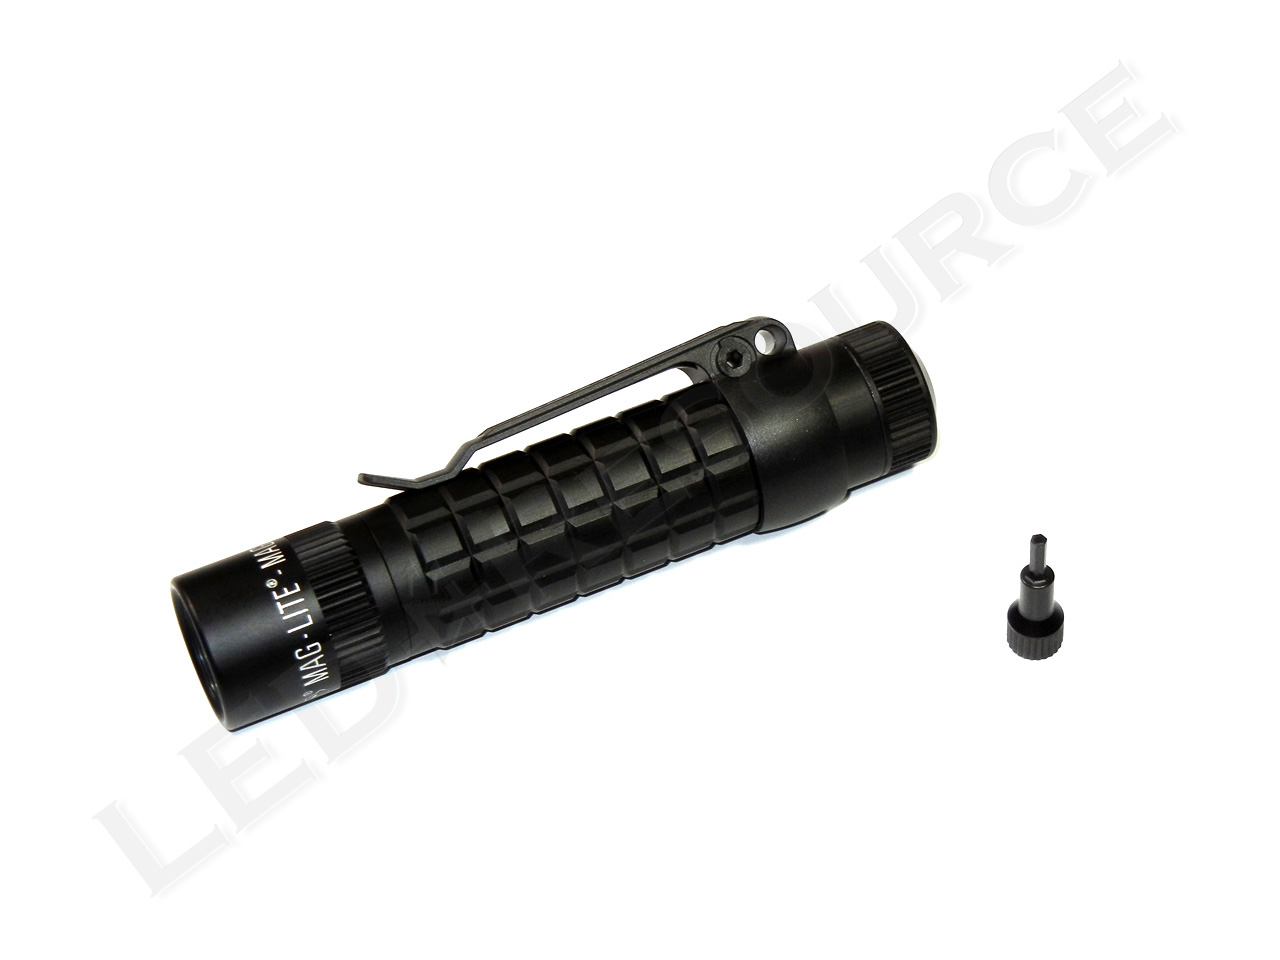 Maglite Mag Tac Led Flashlight Review Led Resource